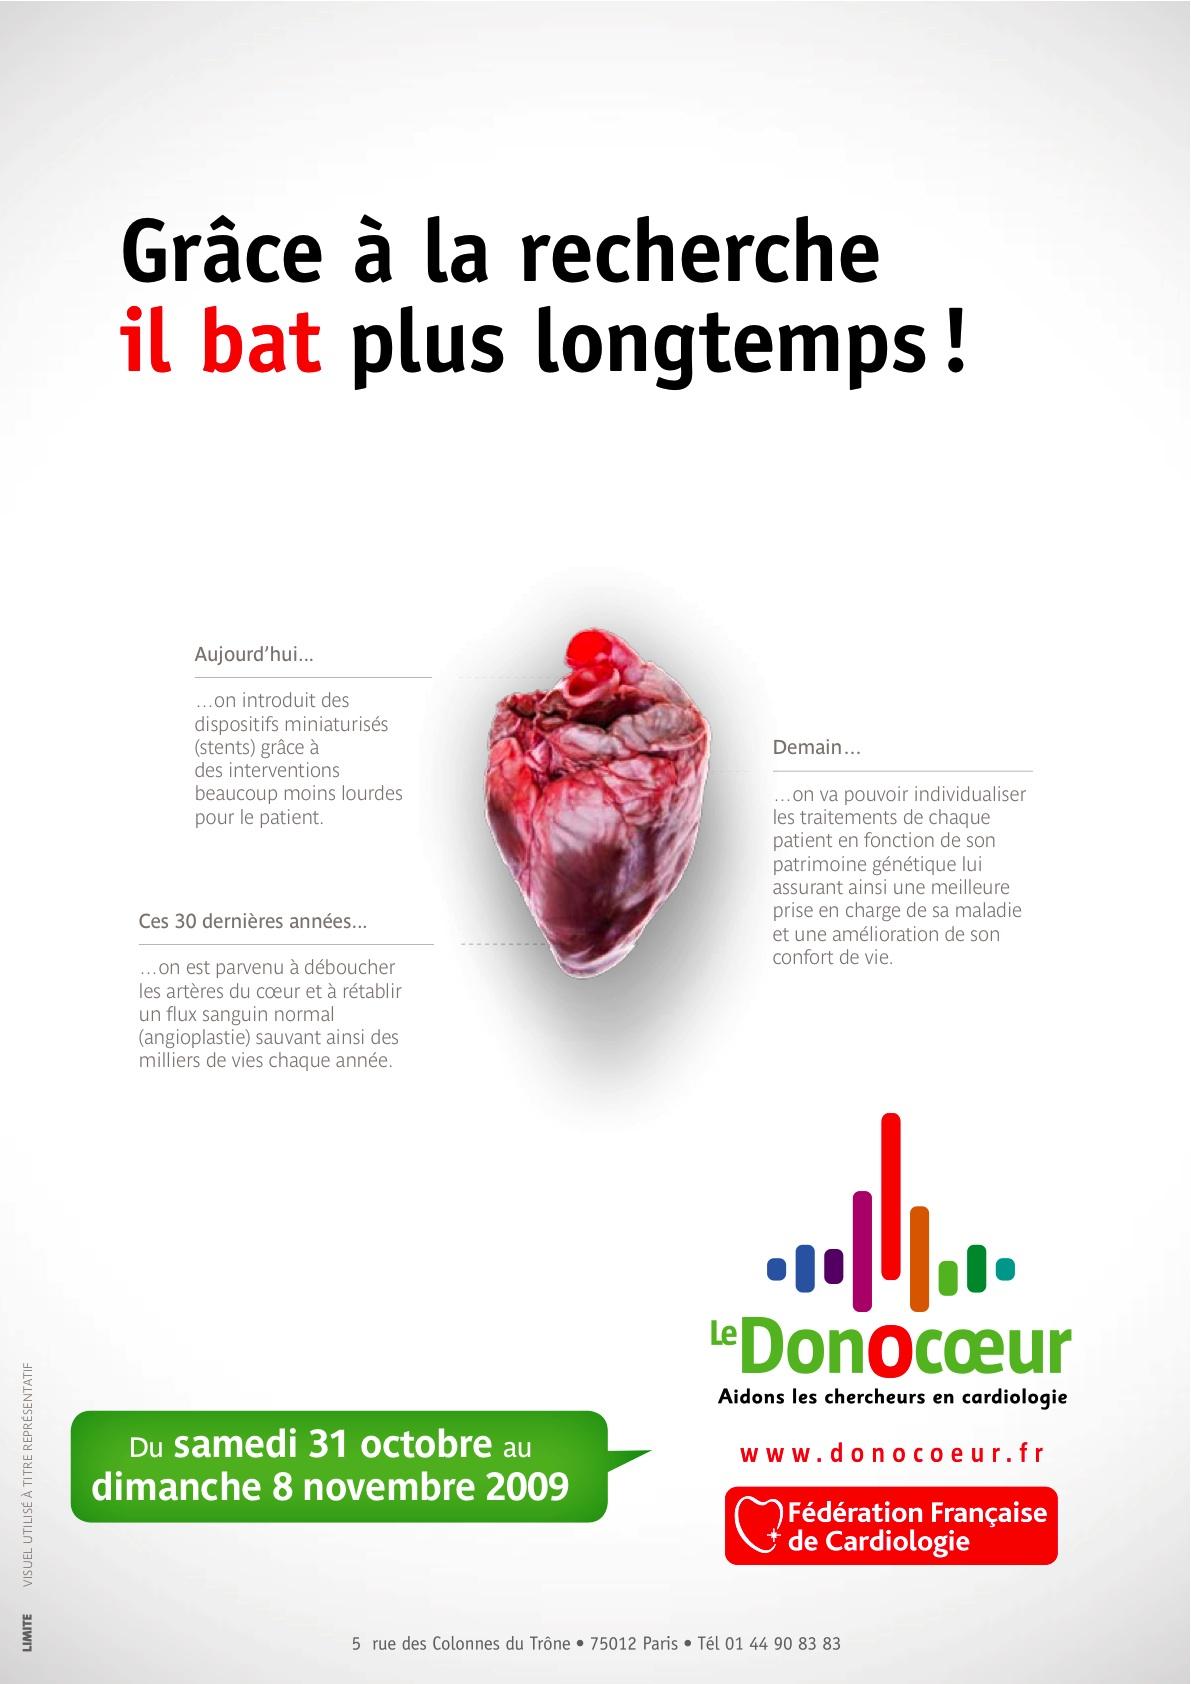 AP Donocœur